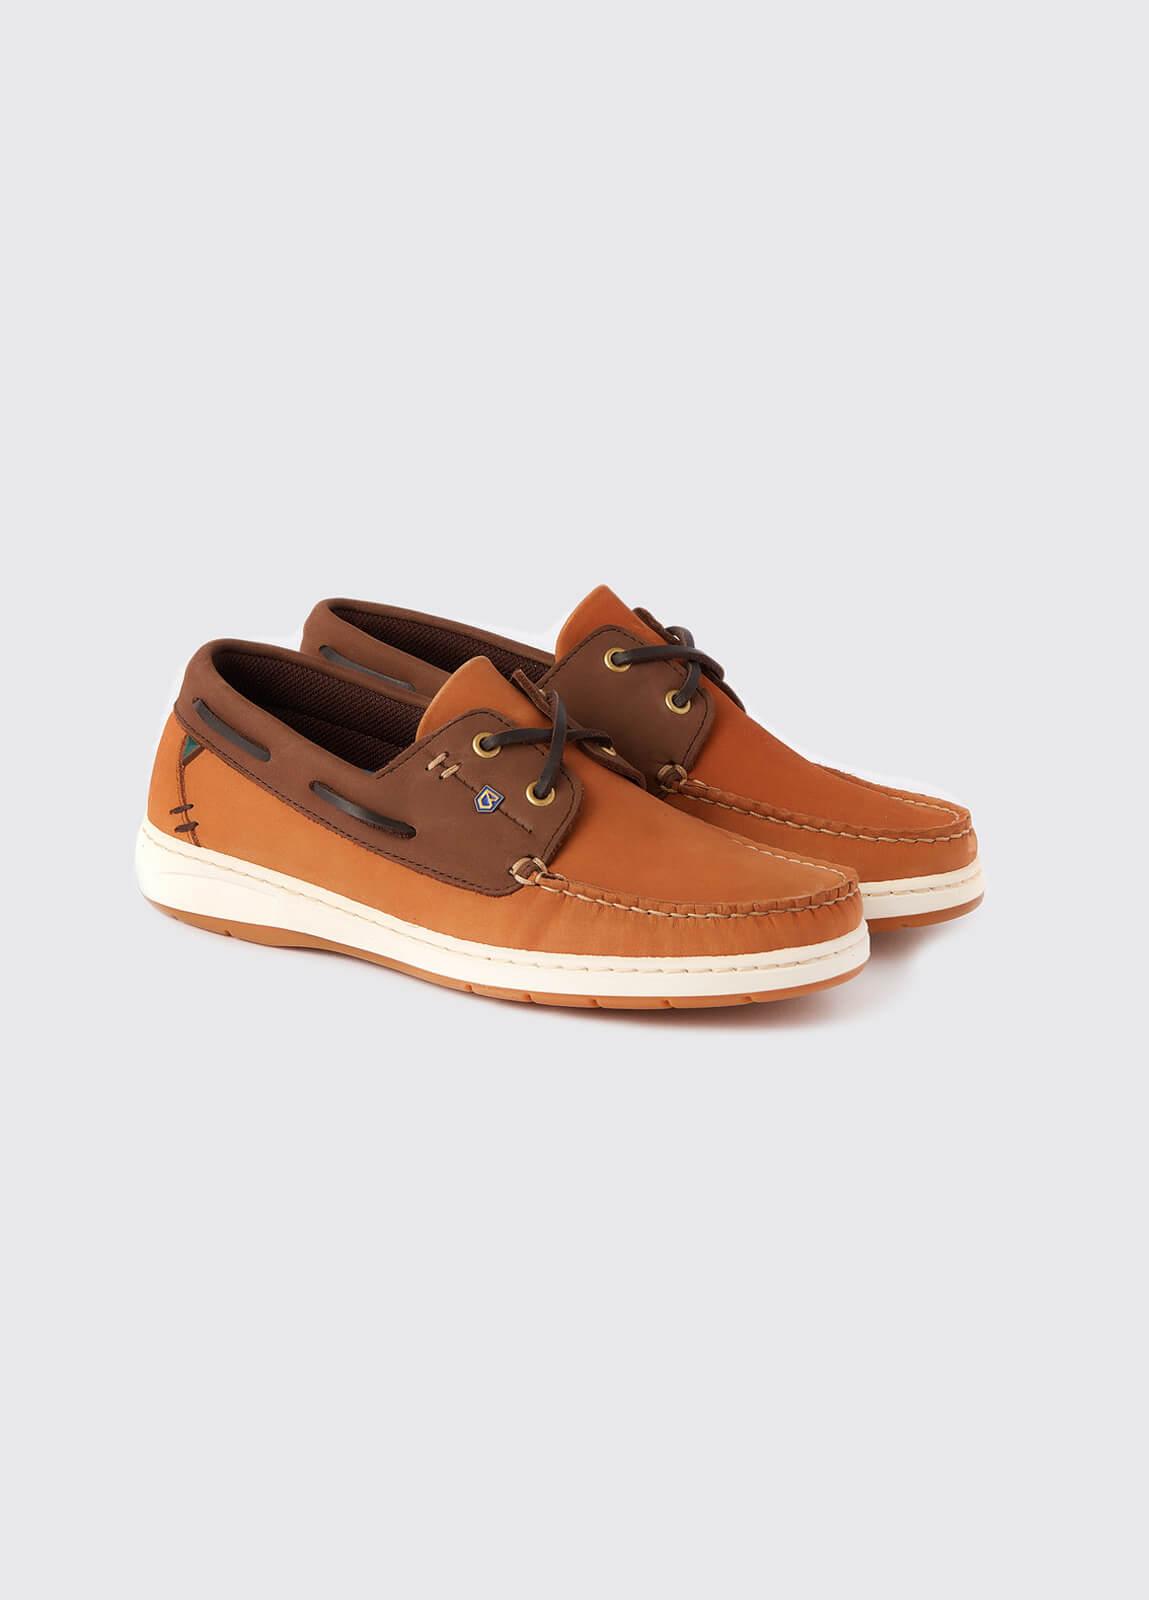 Florida Deck shoes - Café/Caramel